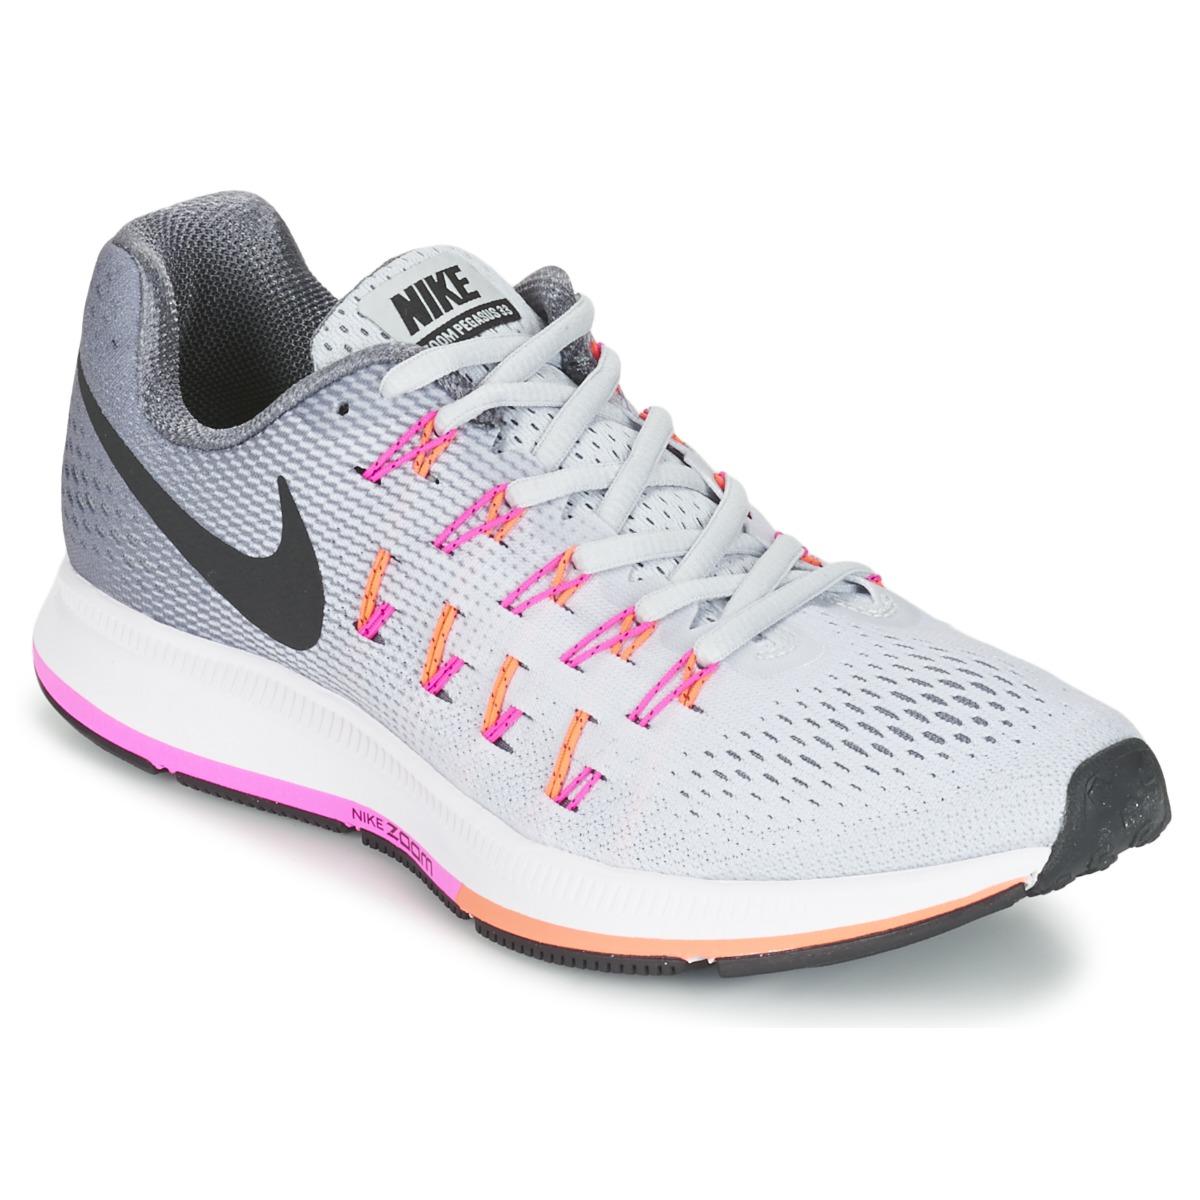 online store 14fba 33bca ... nike soldes air max - Nike AIR ZOOM PEGASUS 33 W Gris / Rose -  Livraison Nike Air Zoom Pegasus 33 M Chaussures homme nike free run ...